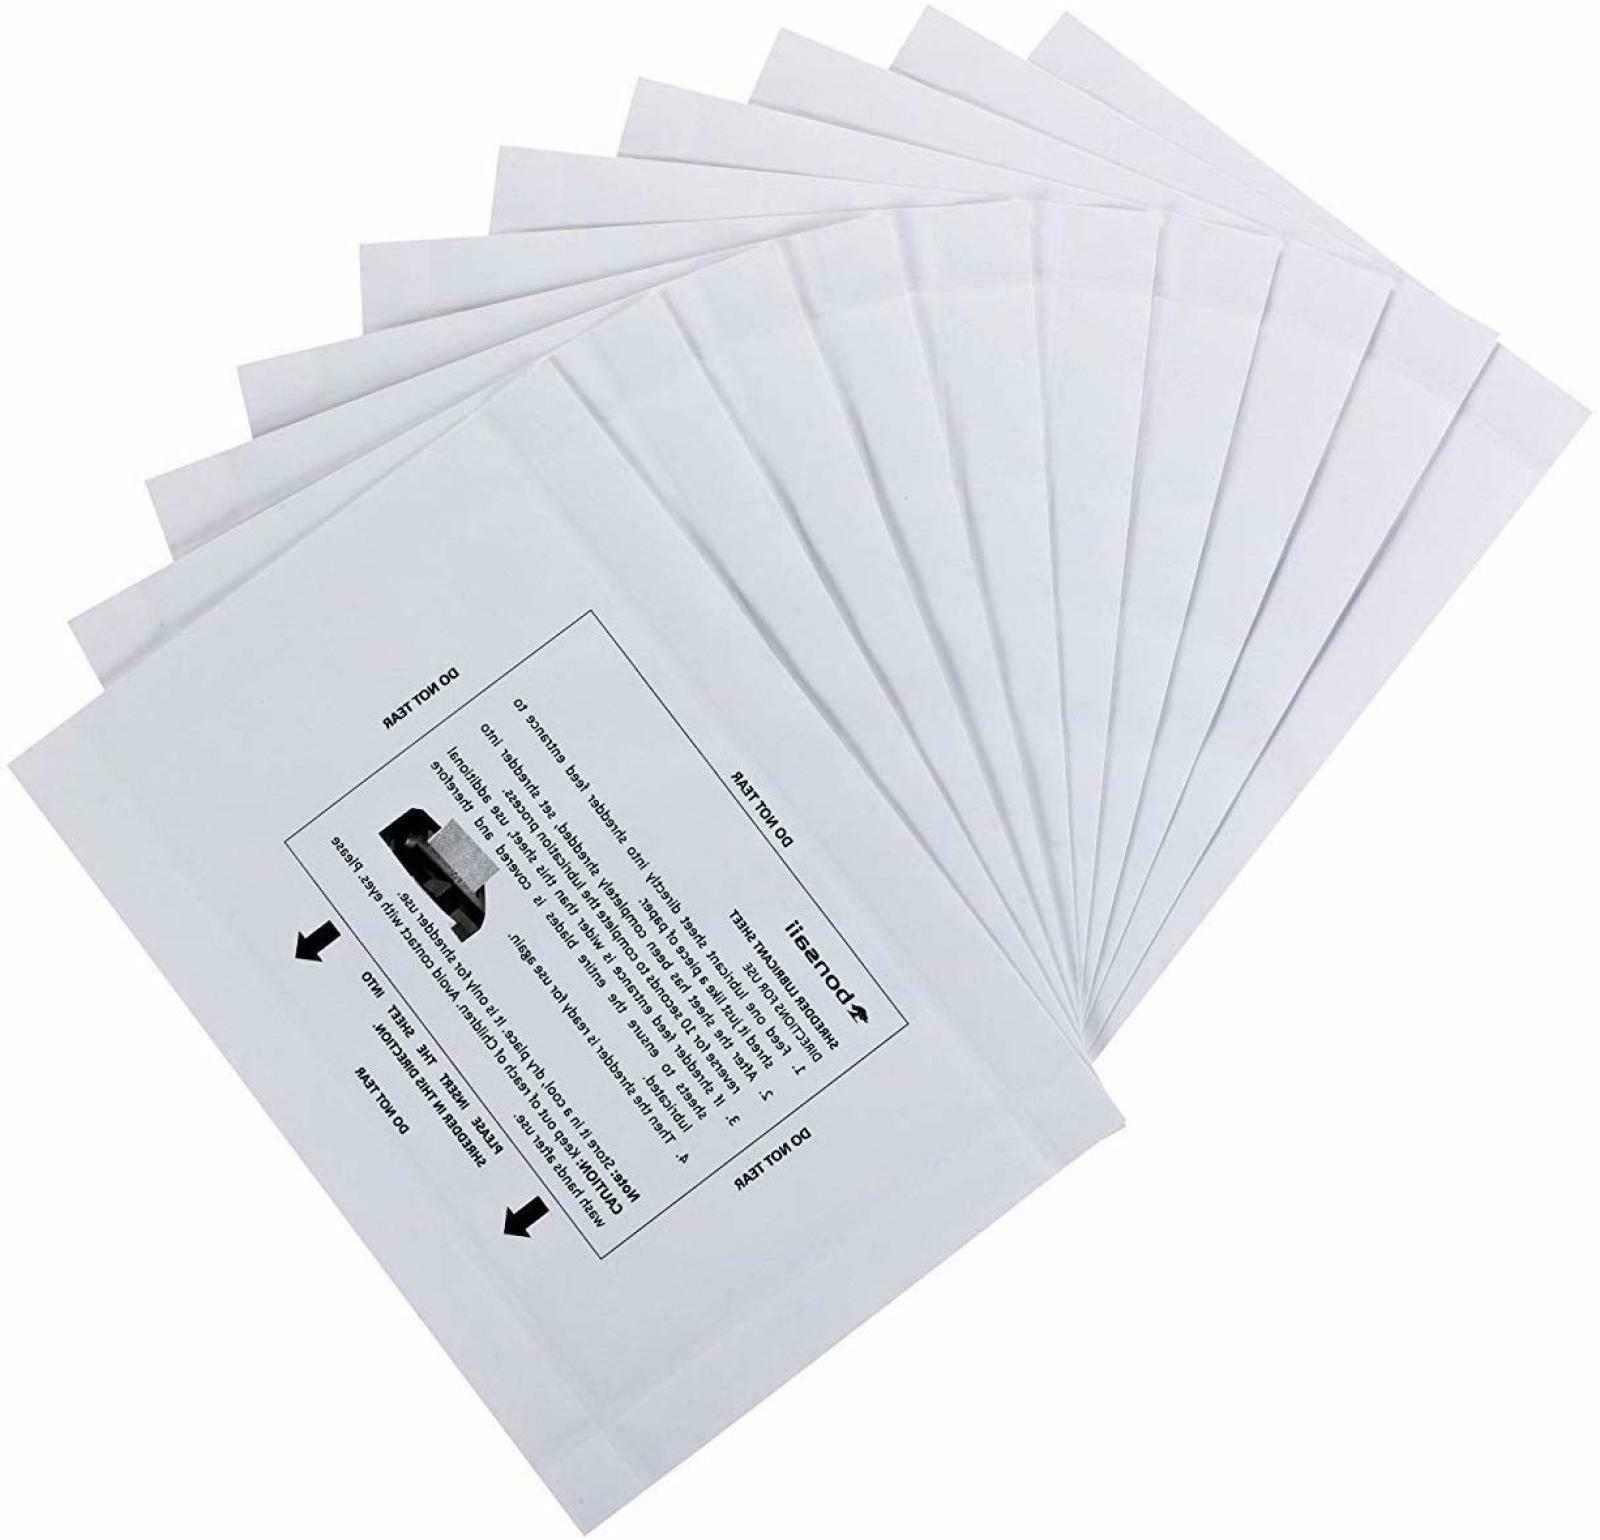 Bonsaii 15-Pack Paper Shredder Sharpening Lubricant Sheets f